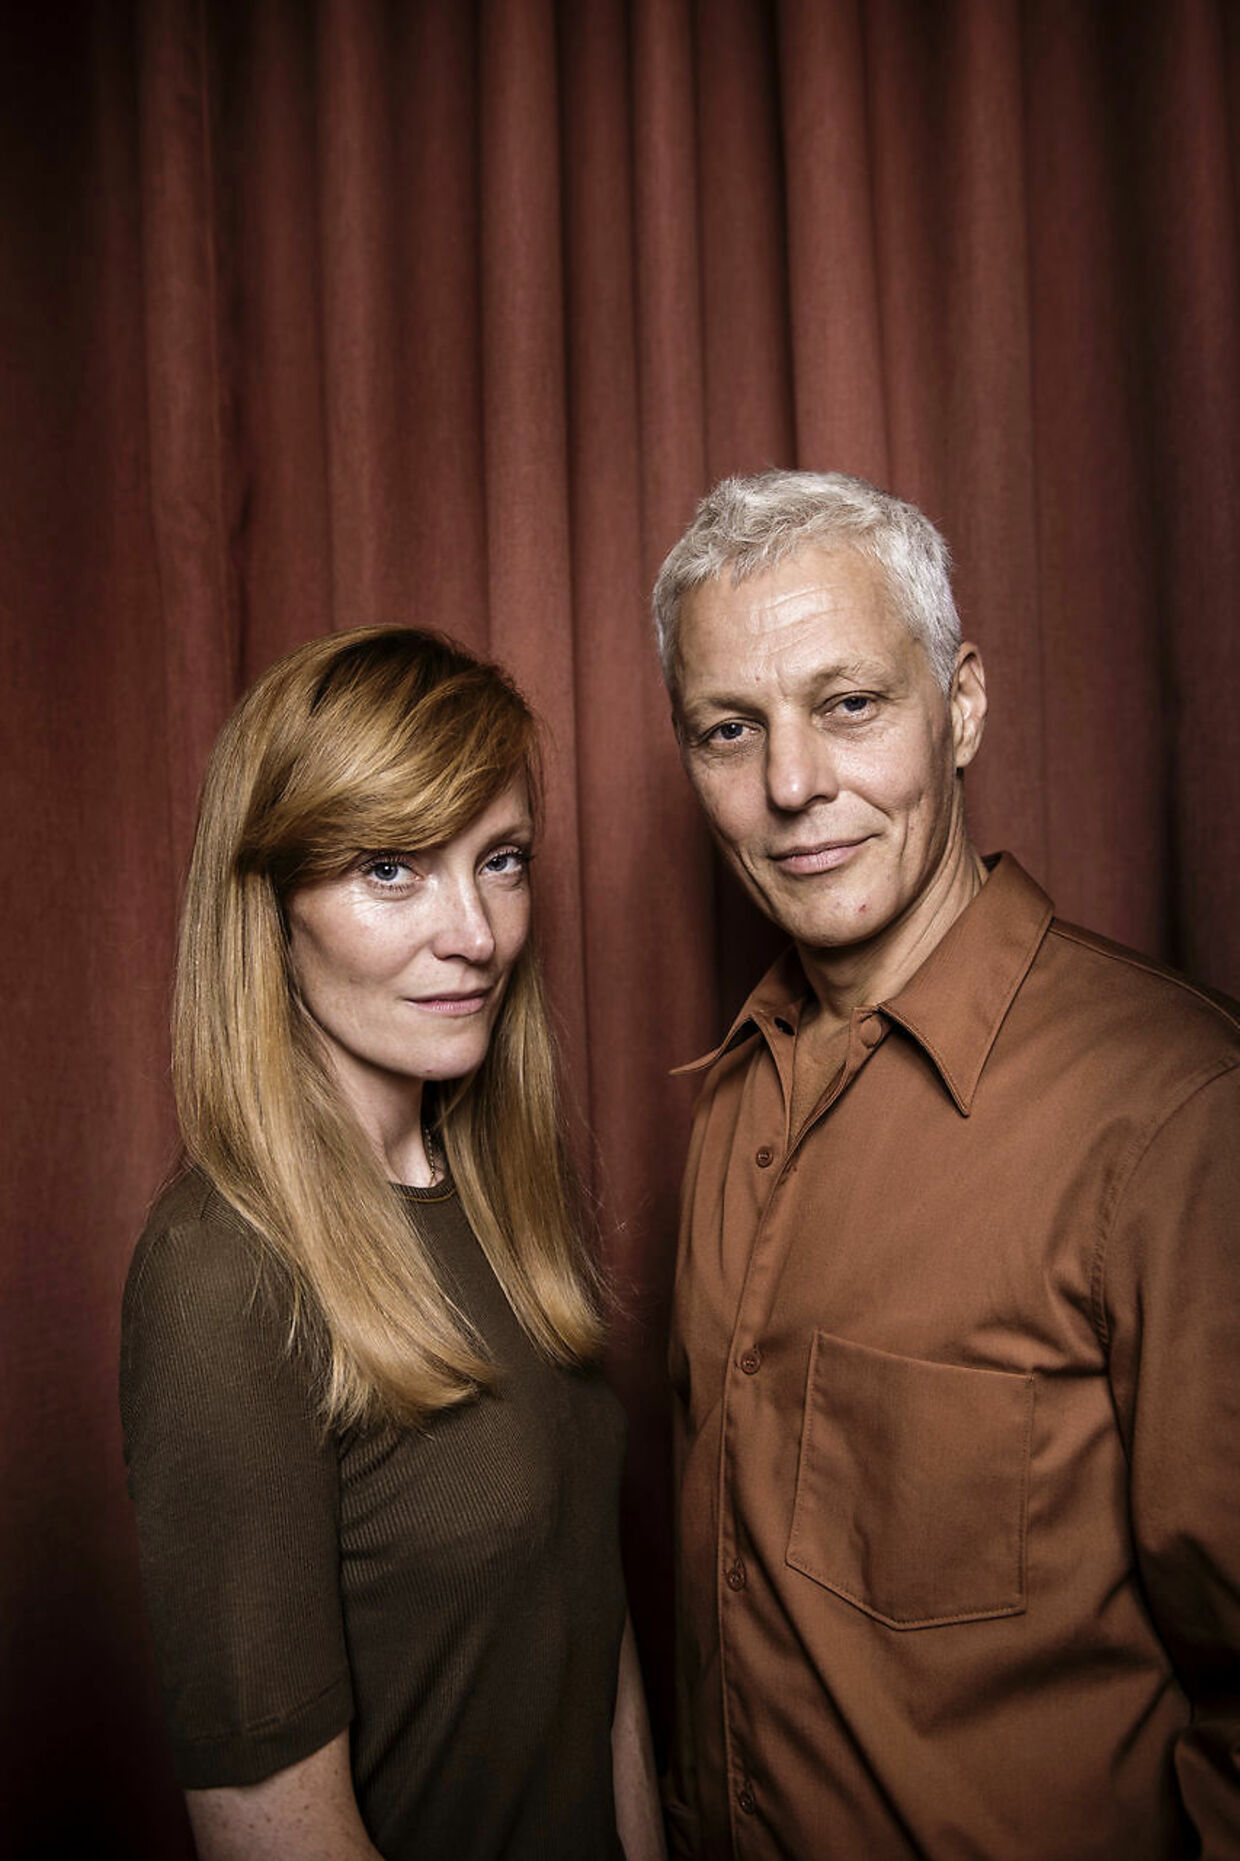 Ægteparret Stine Goya og Thomas Hertz.